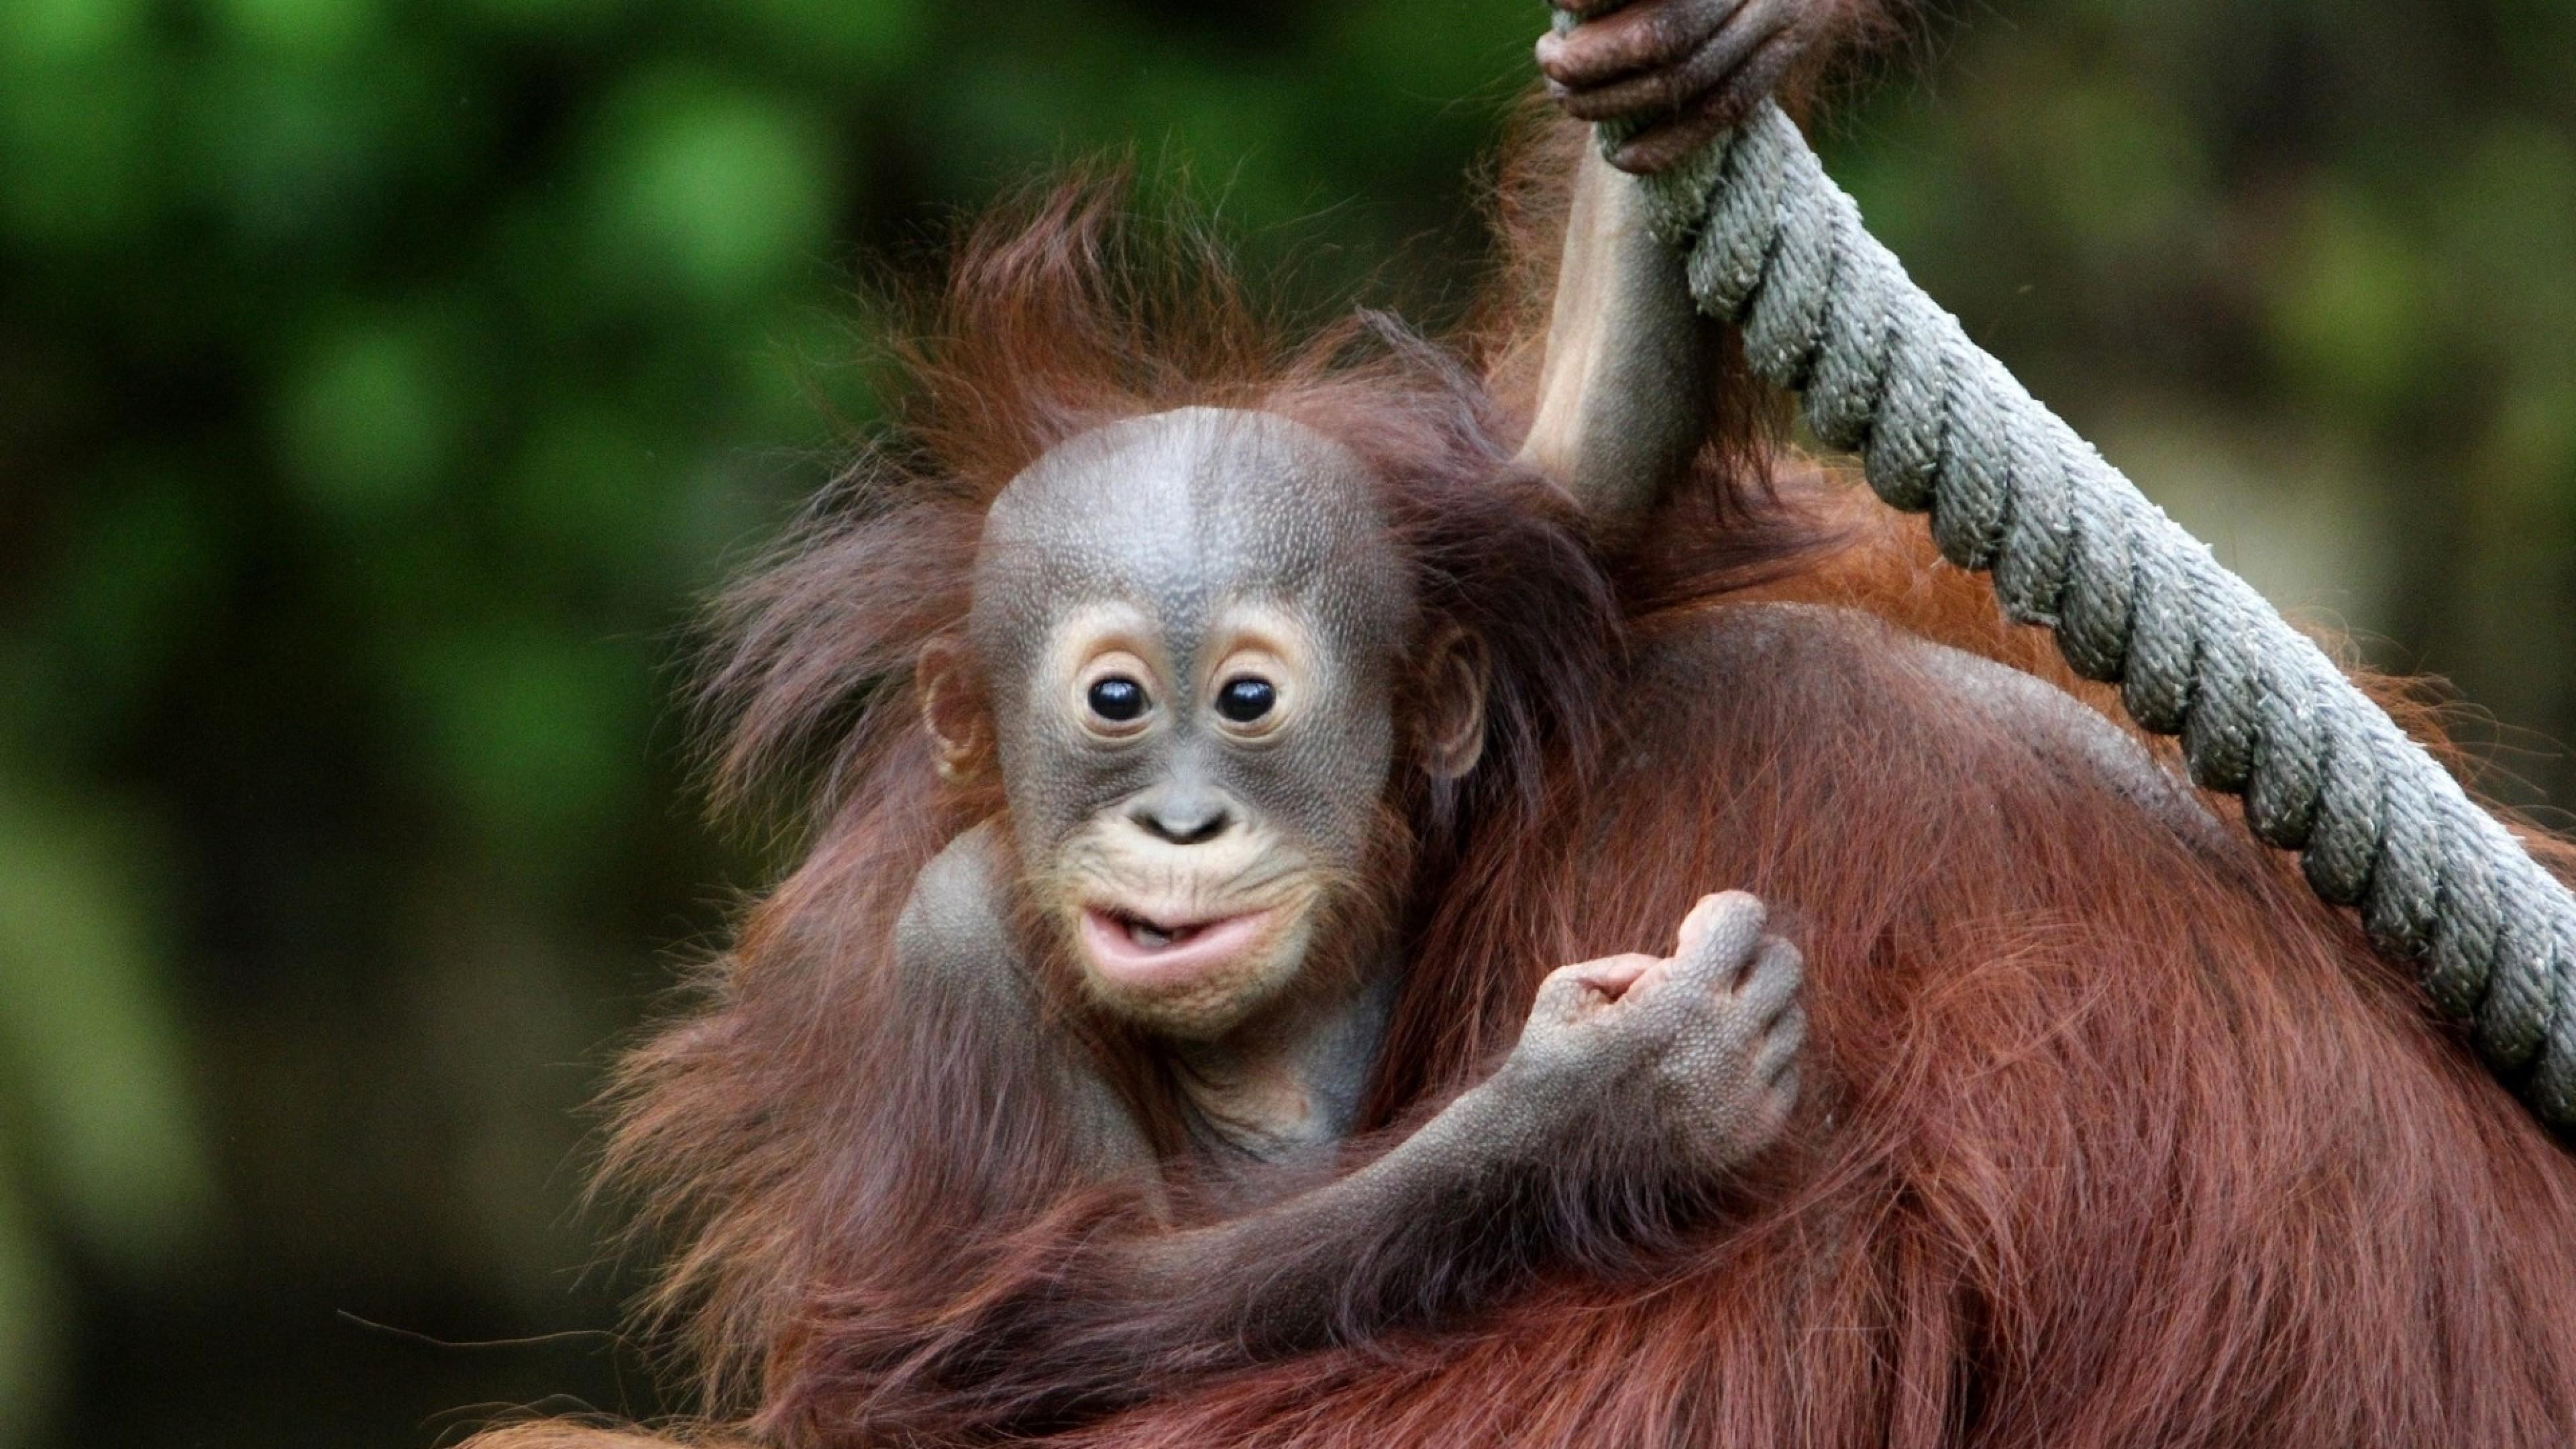 Wallpaper monkey, face, eyes, baby